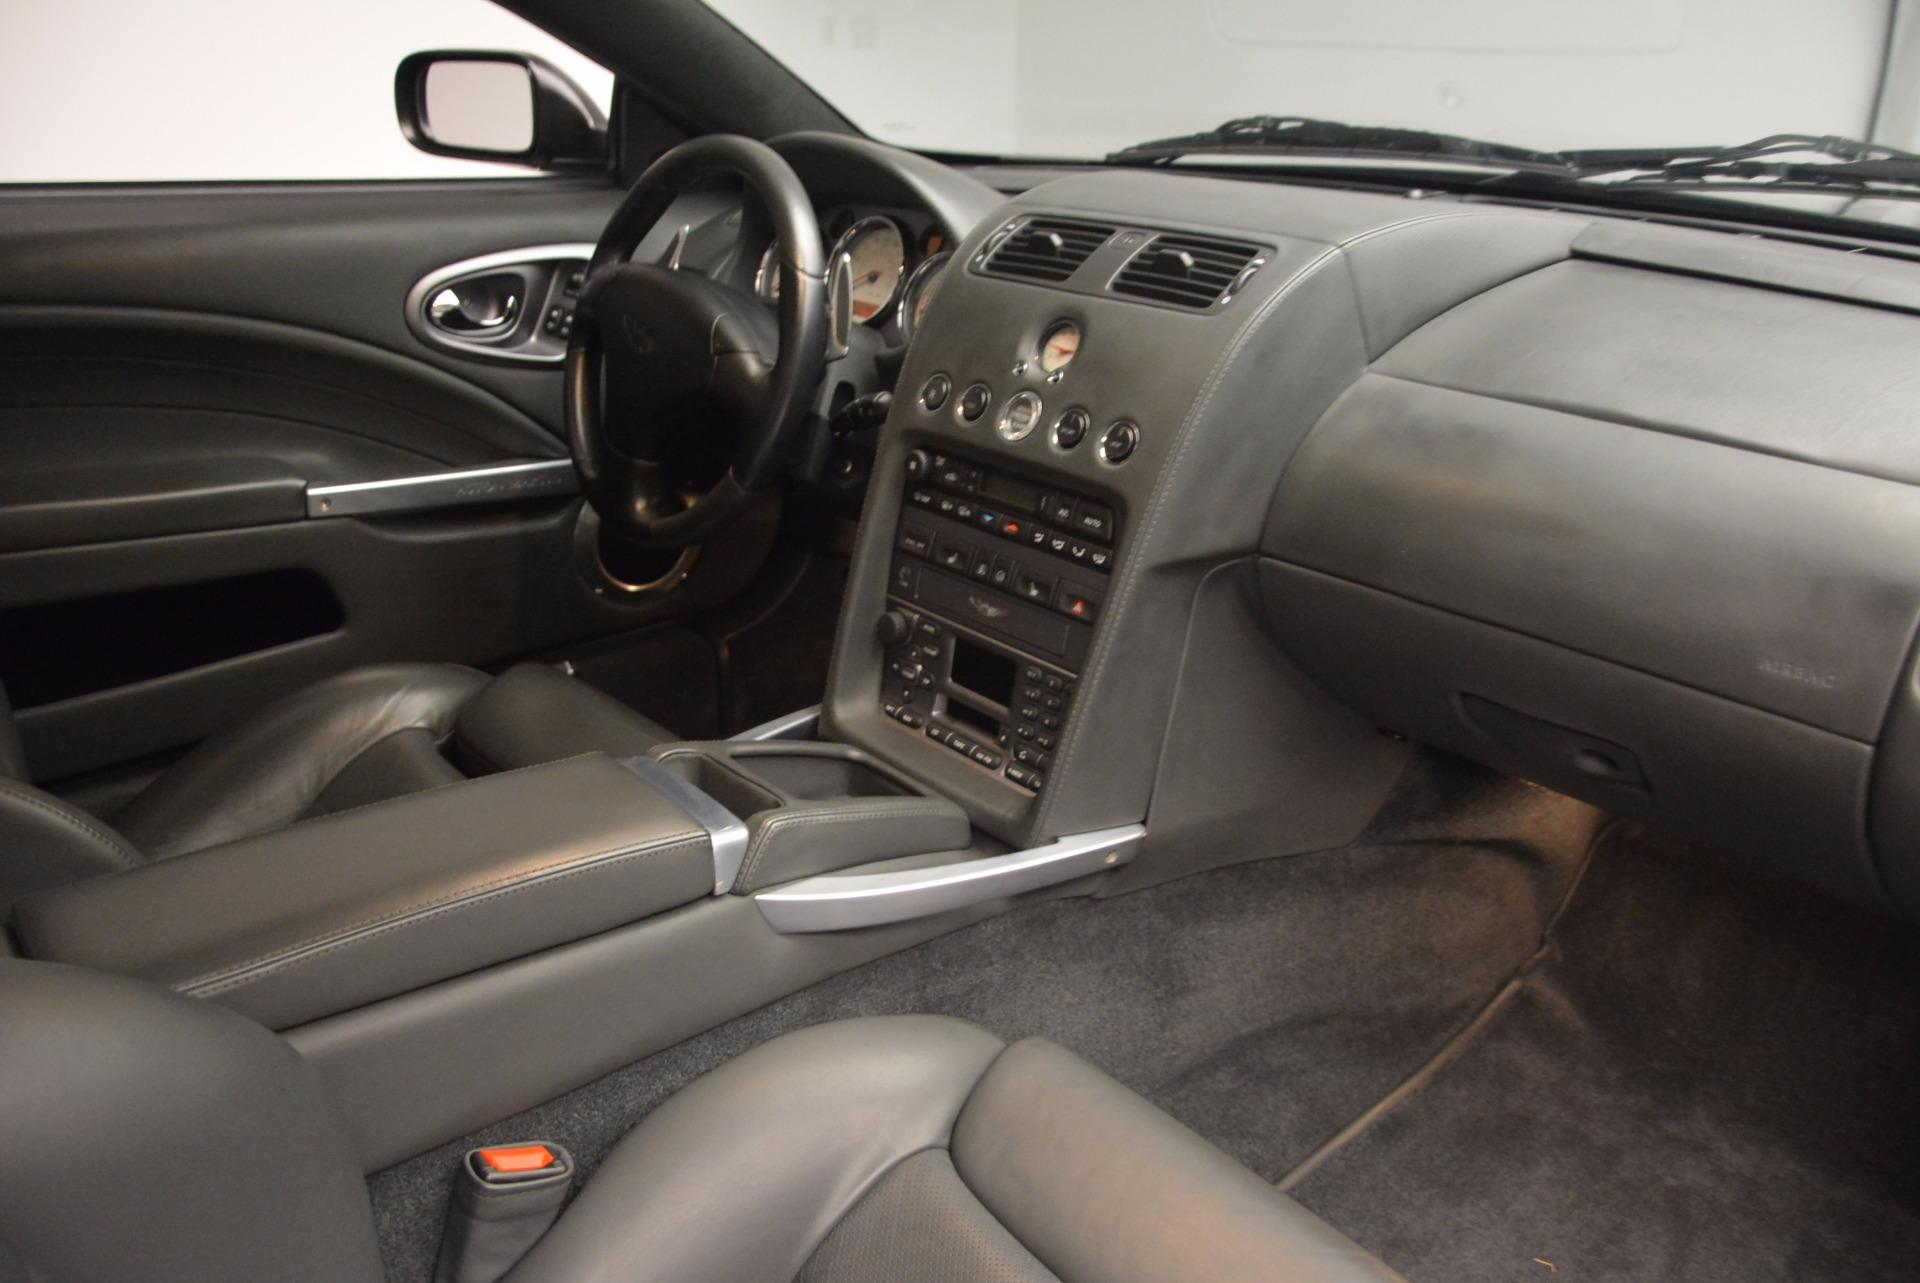 Used 2005 Aston Martin V12 Vanquish S For Sale In Westport, CT 645_p20